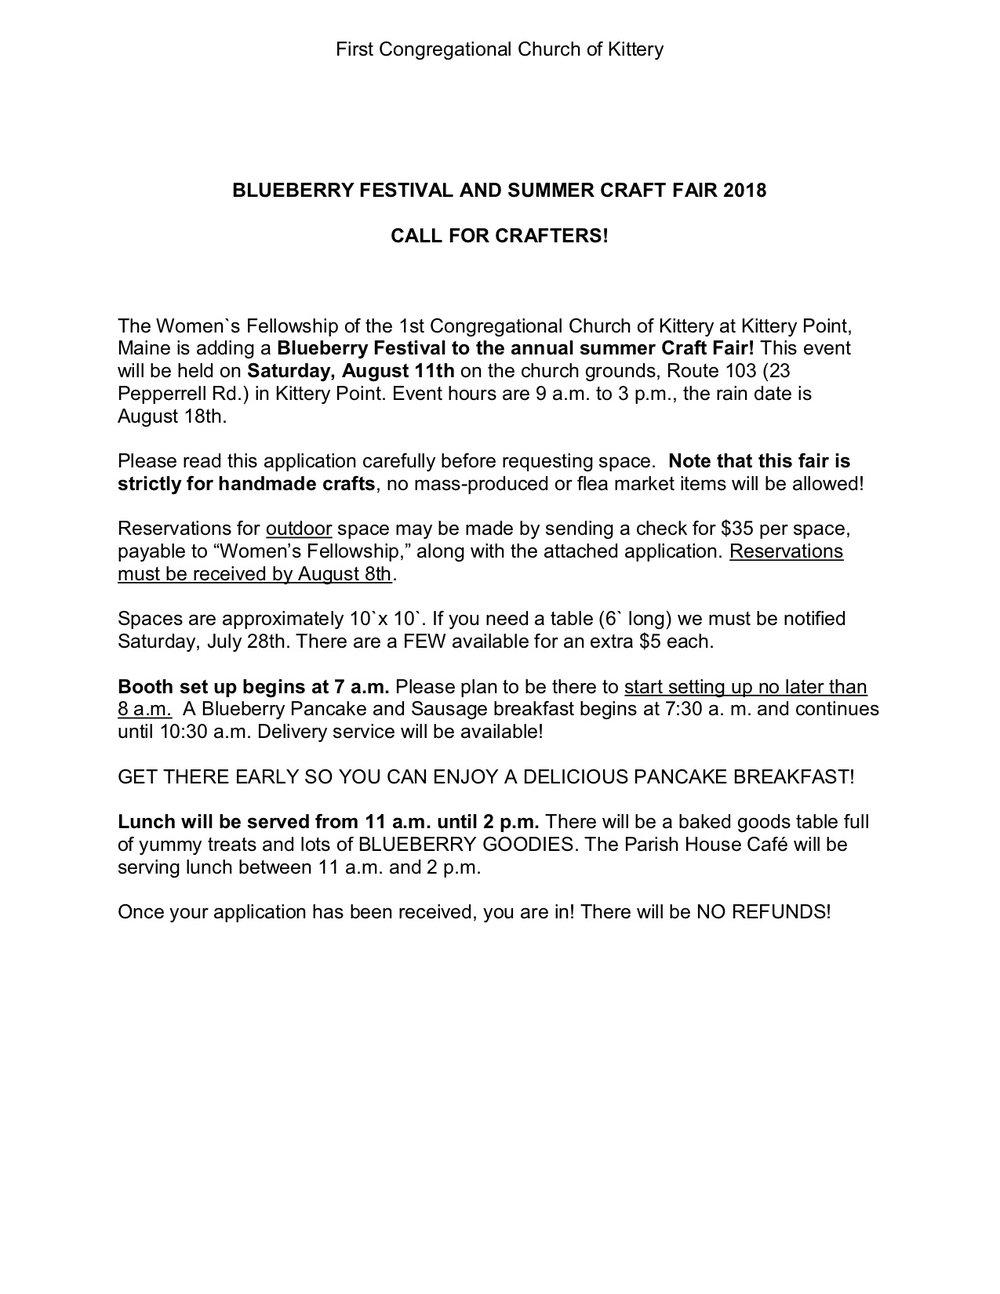 BLUEBERRY FESTIVAL AND SUMMER CRAFT FAIR 2018.jpg